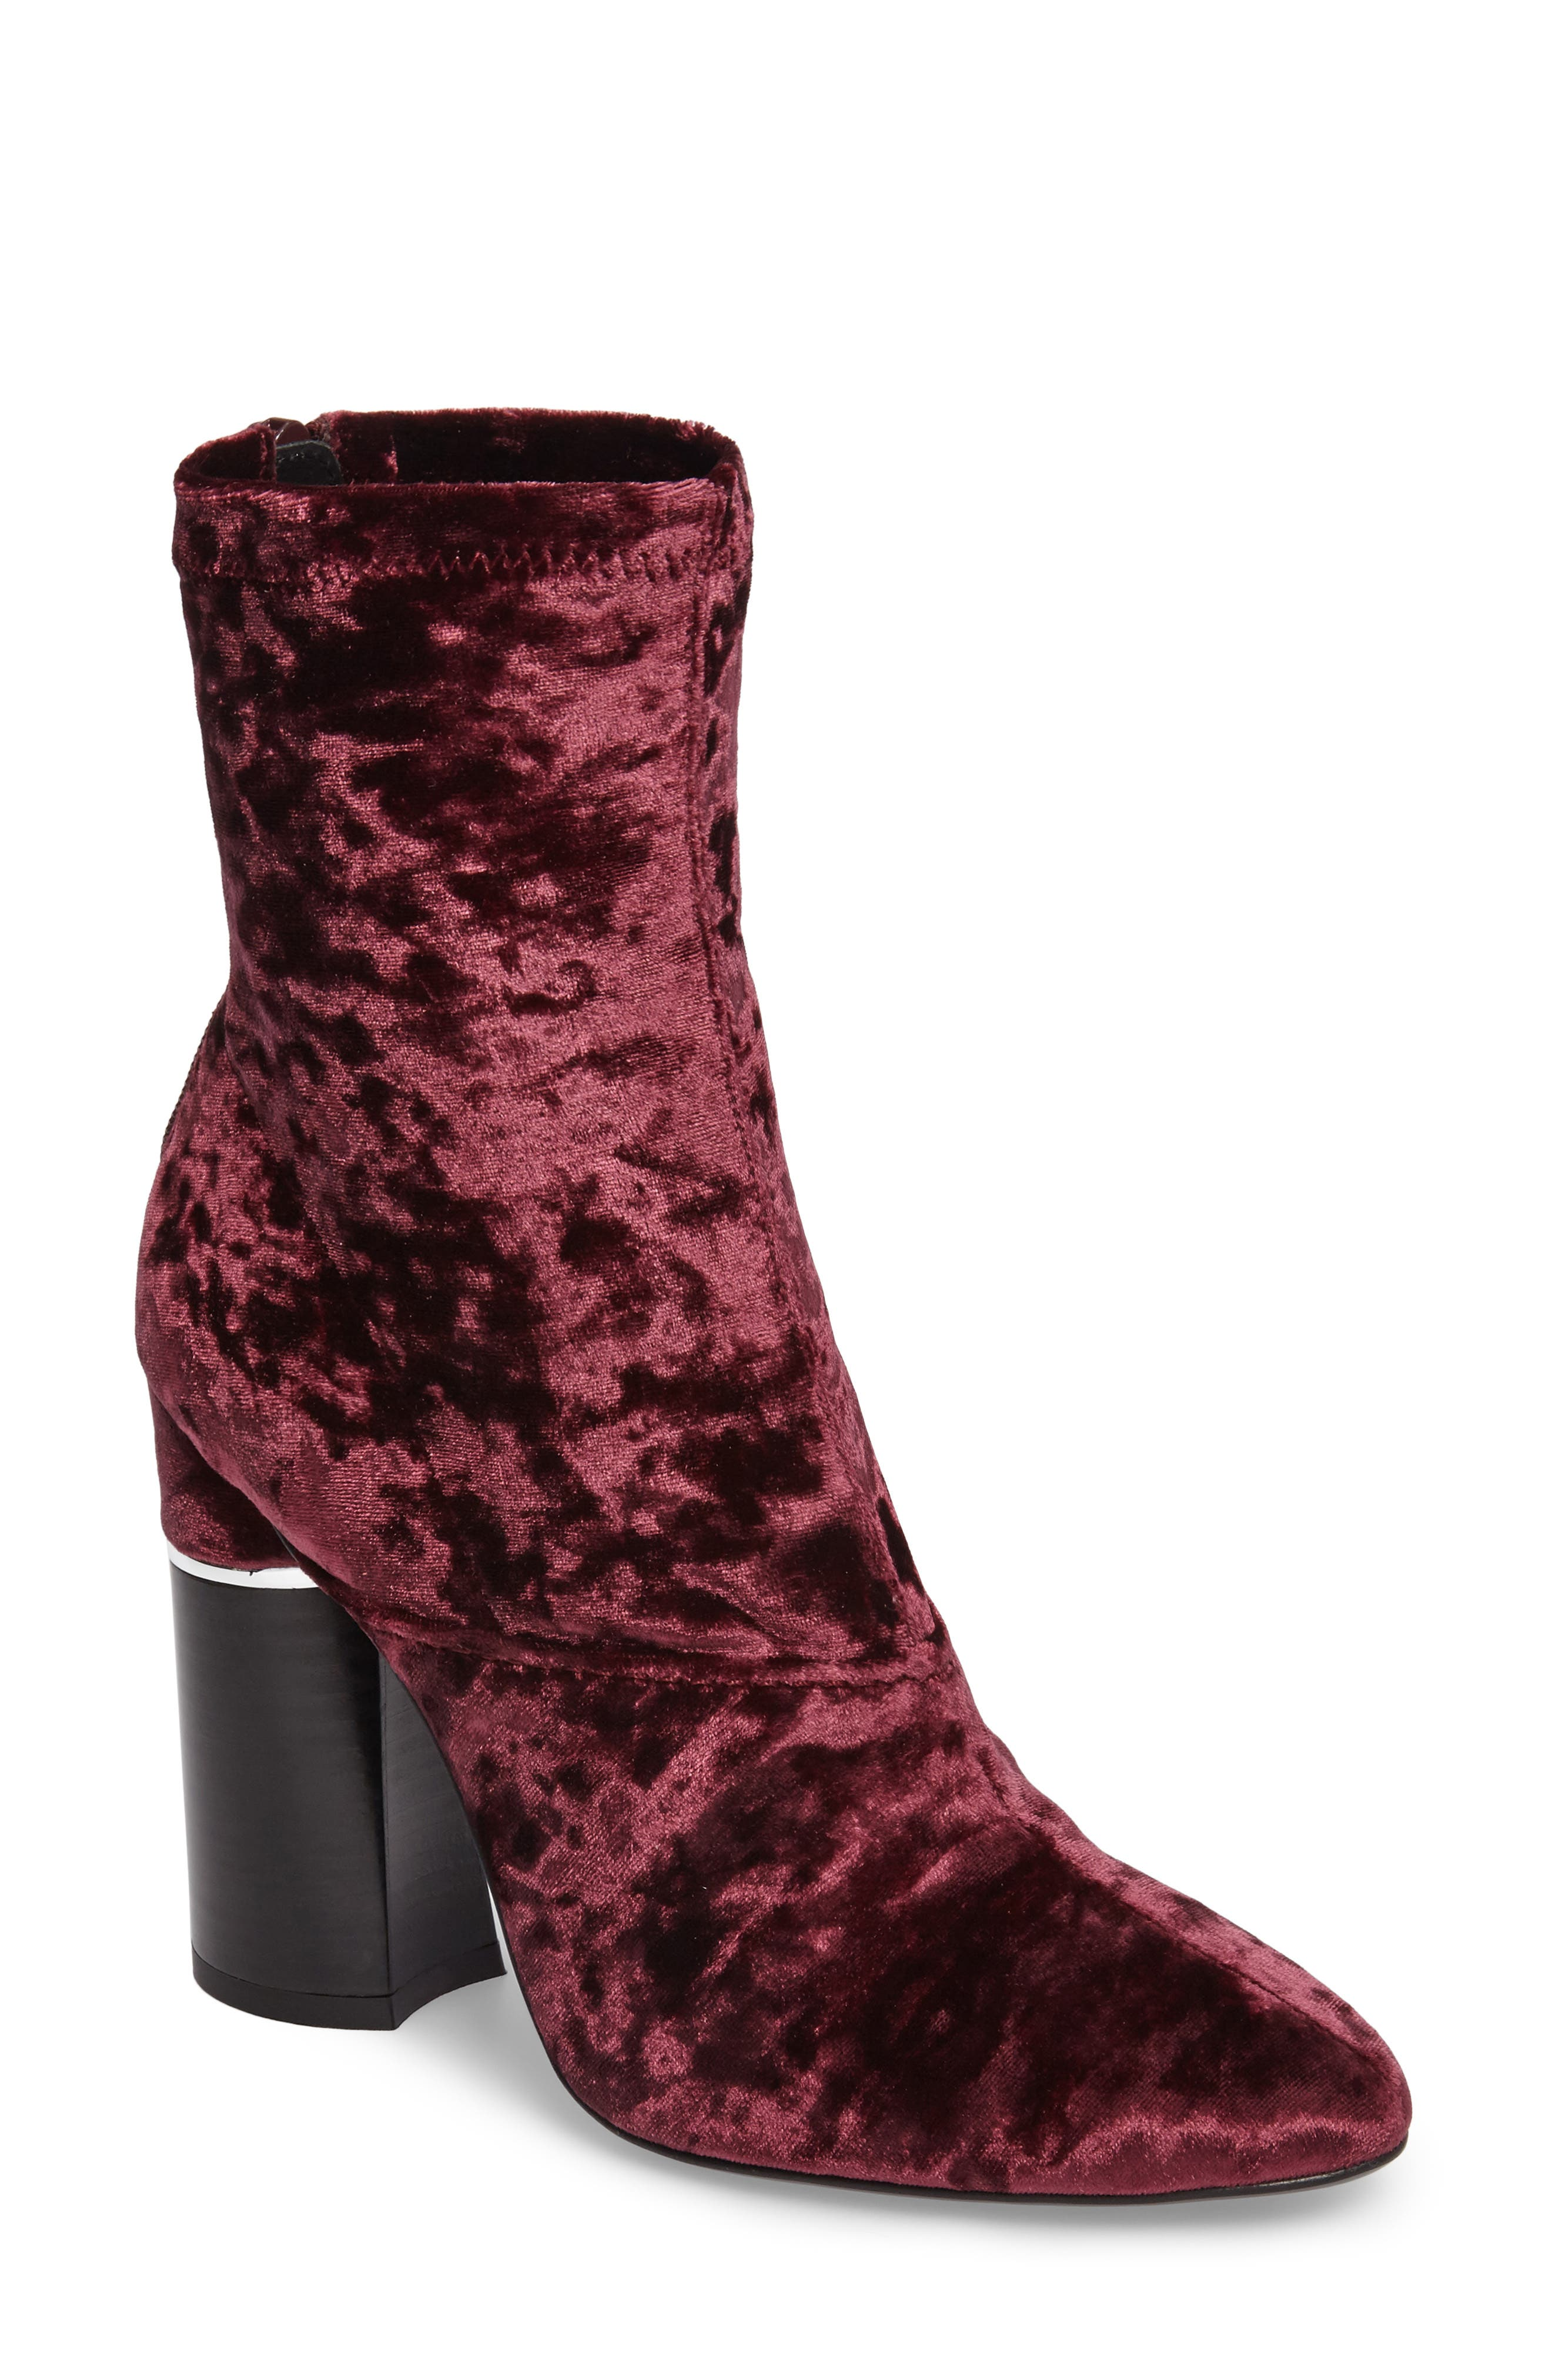 'Kyoto' Crushed Velvet Boot,                         Main,                         color, Syrah